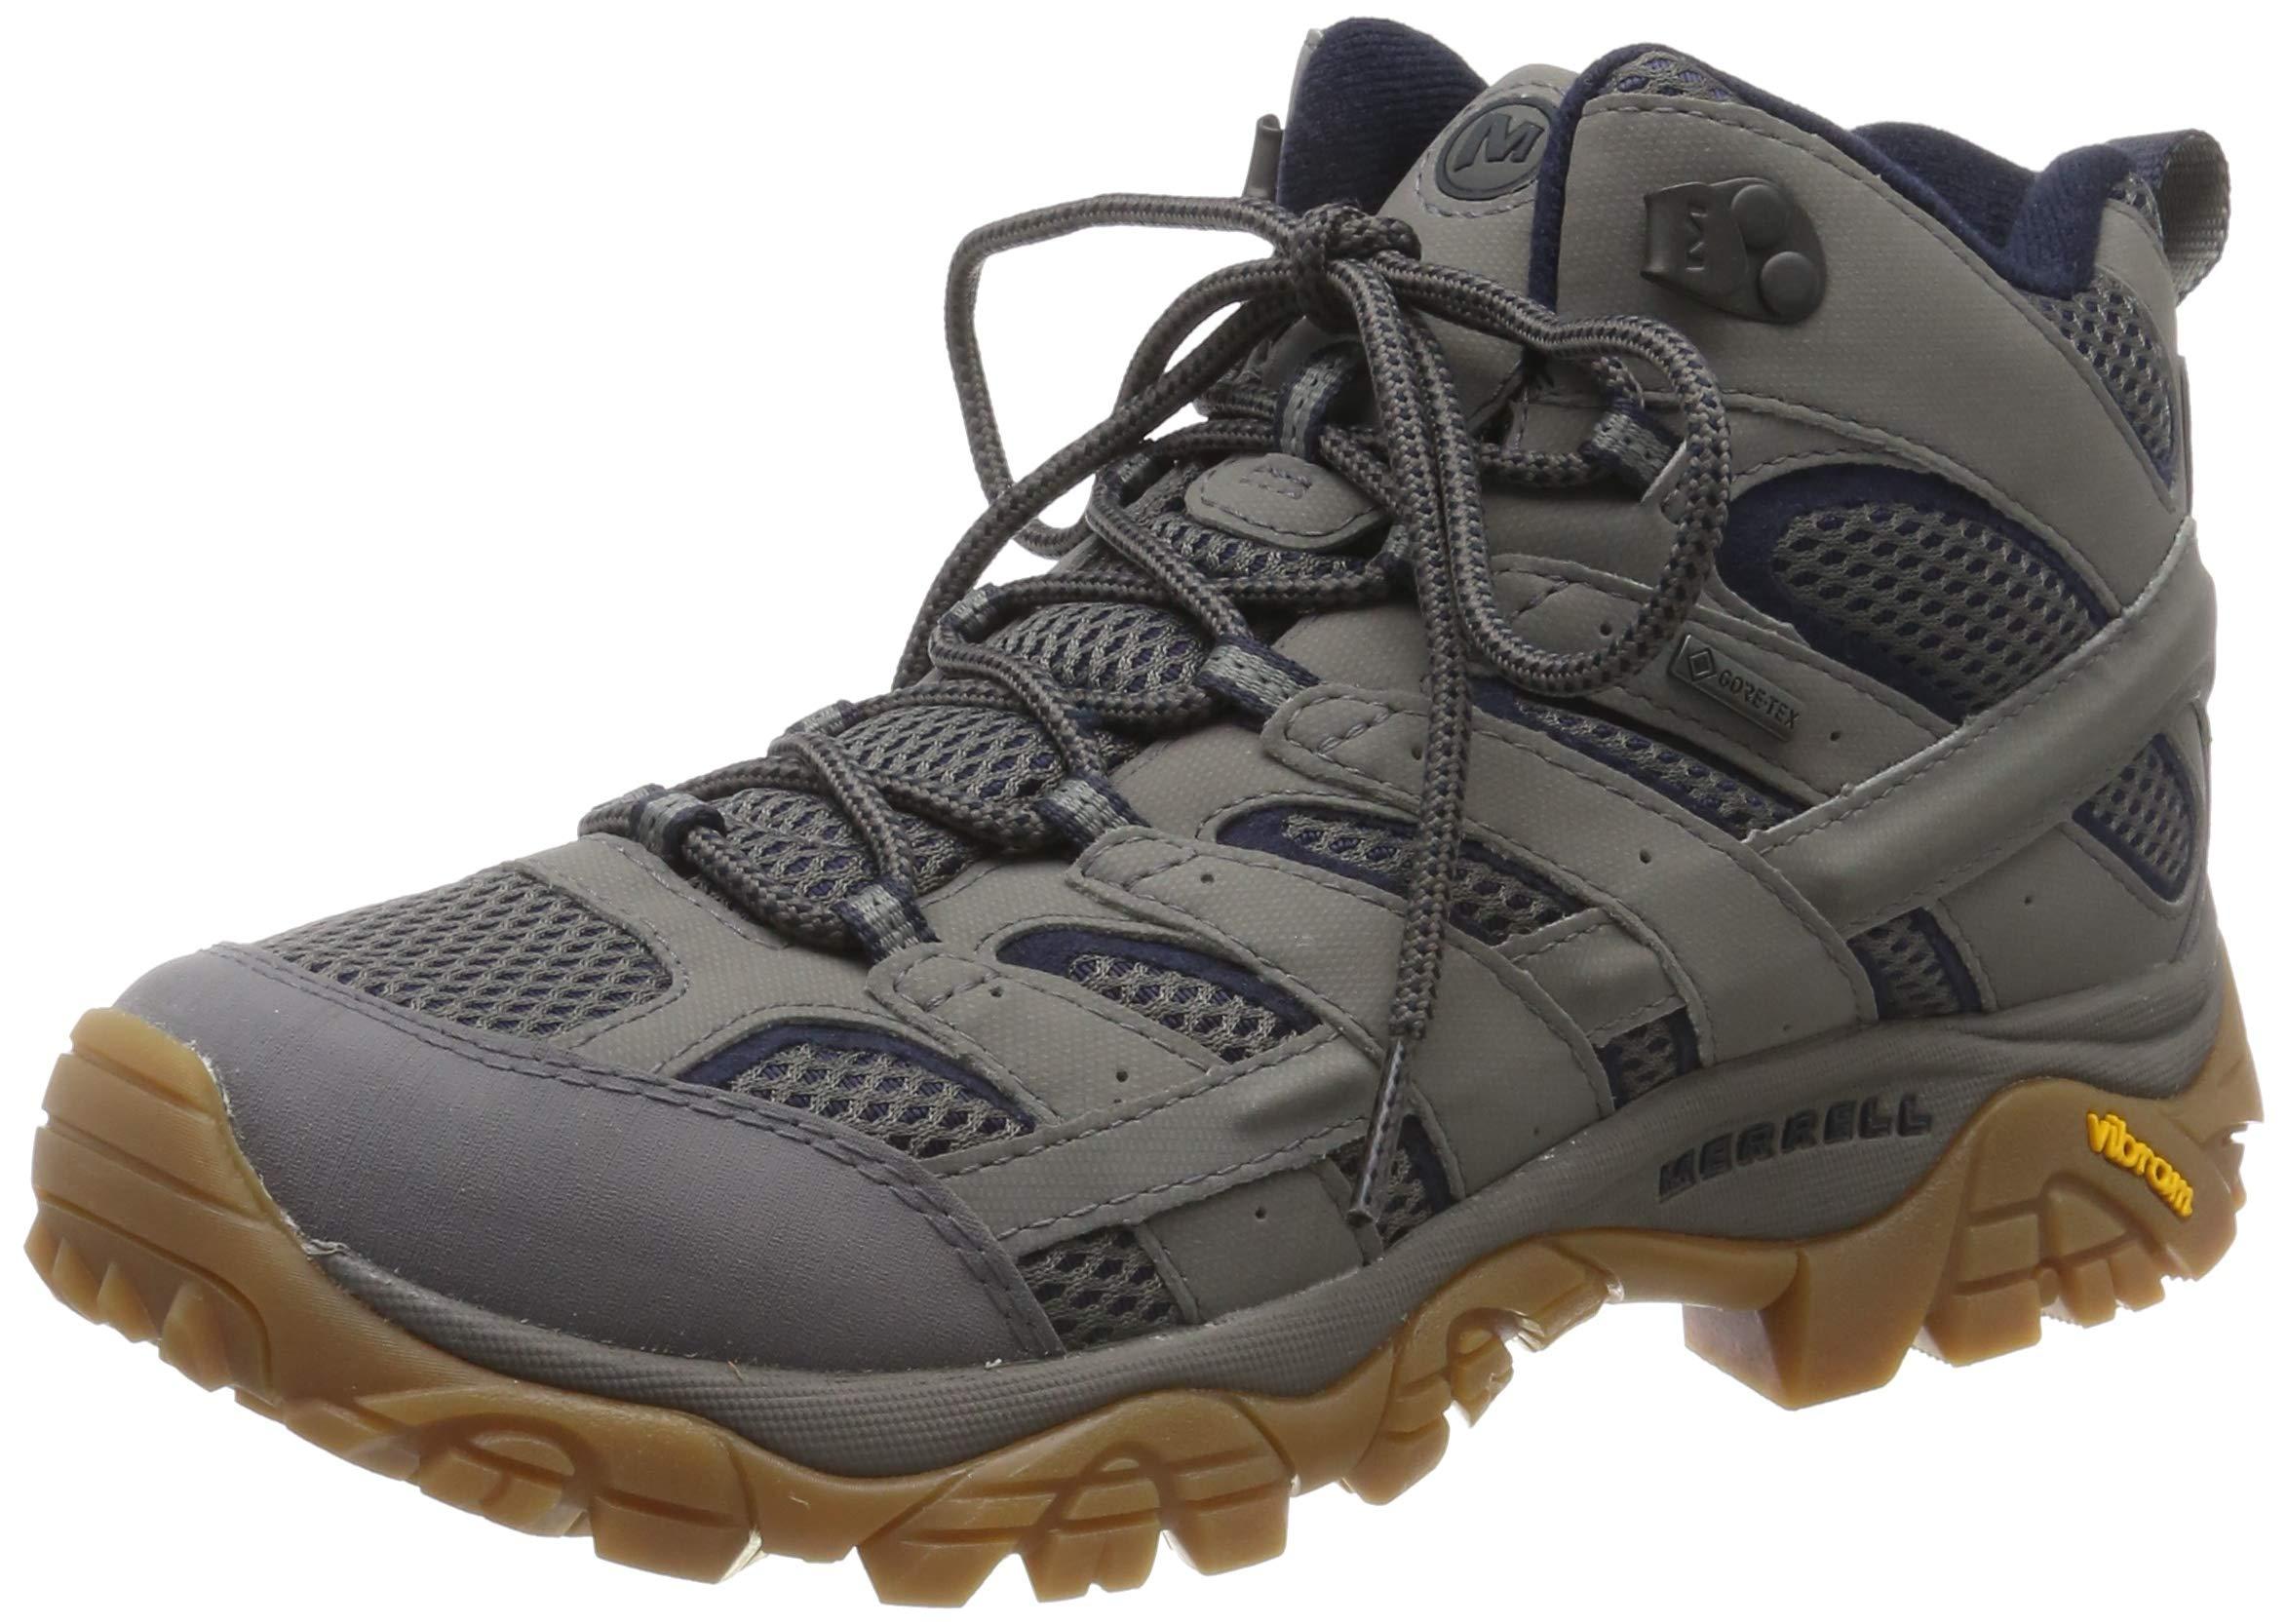 Merrell Men's Moab 2 Mid Gore-tex High Rise Hiking Shoes 1